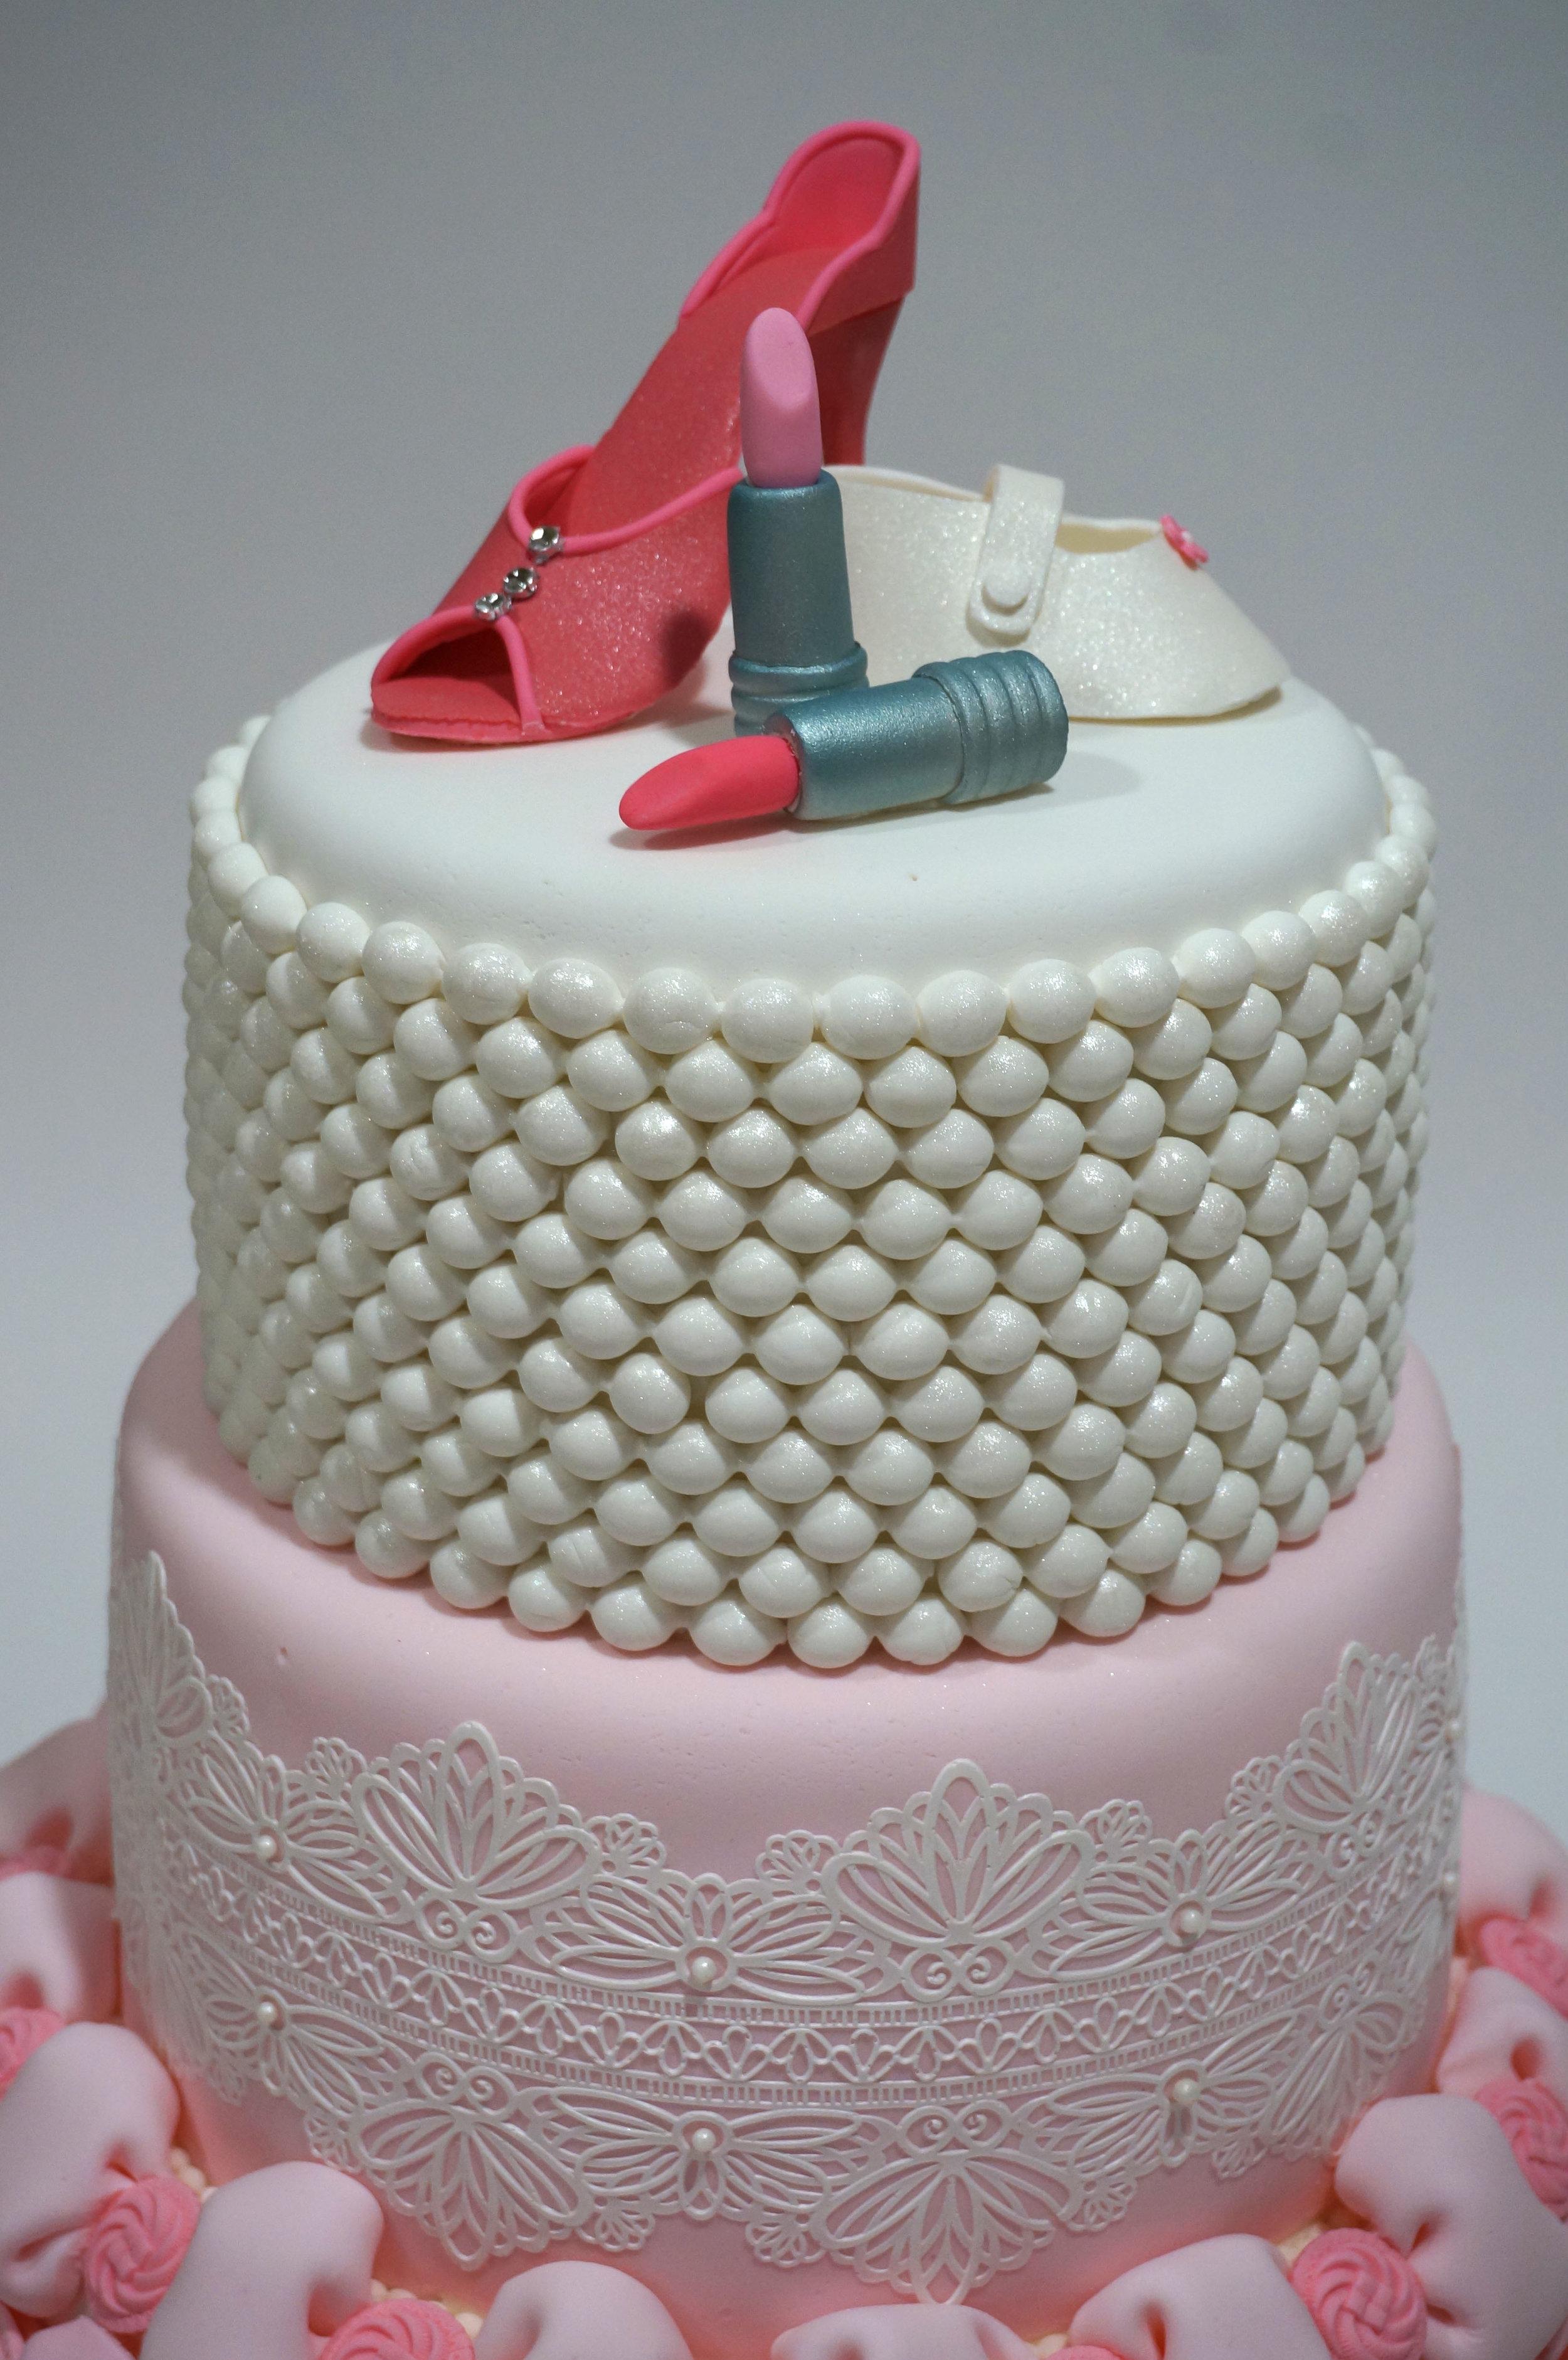 Sugar shoes and lipstick make a fashion statement